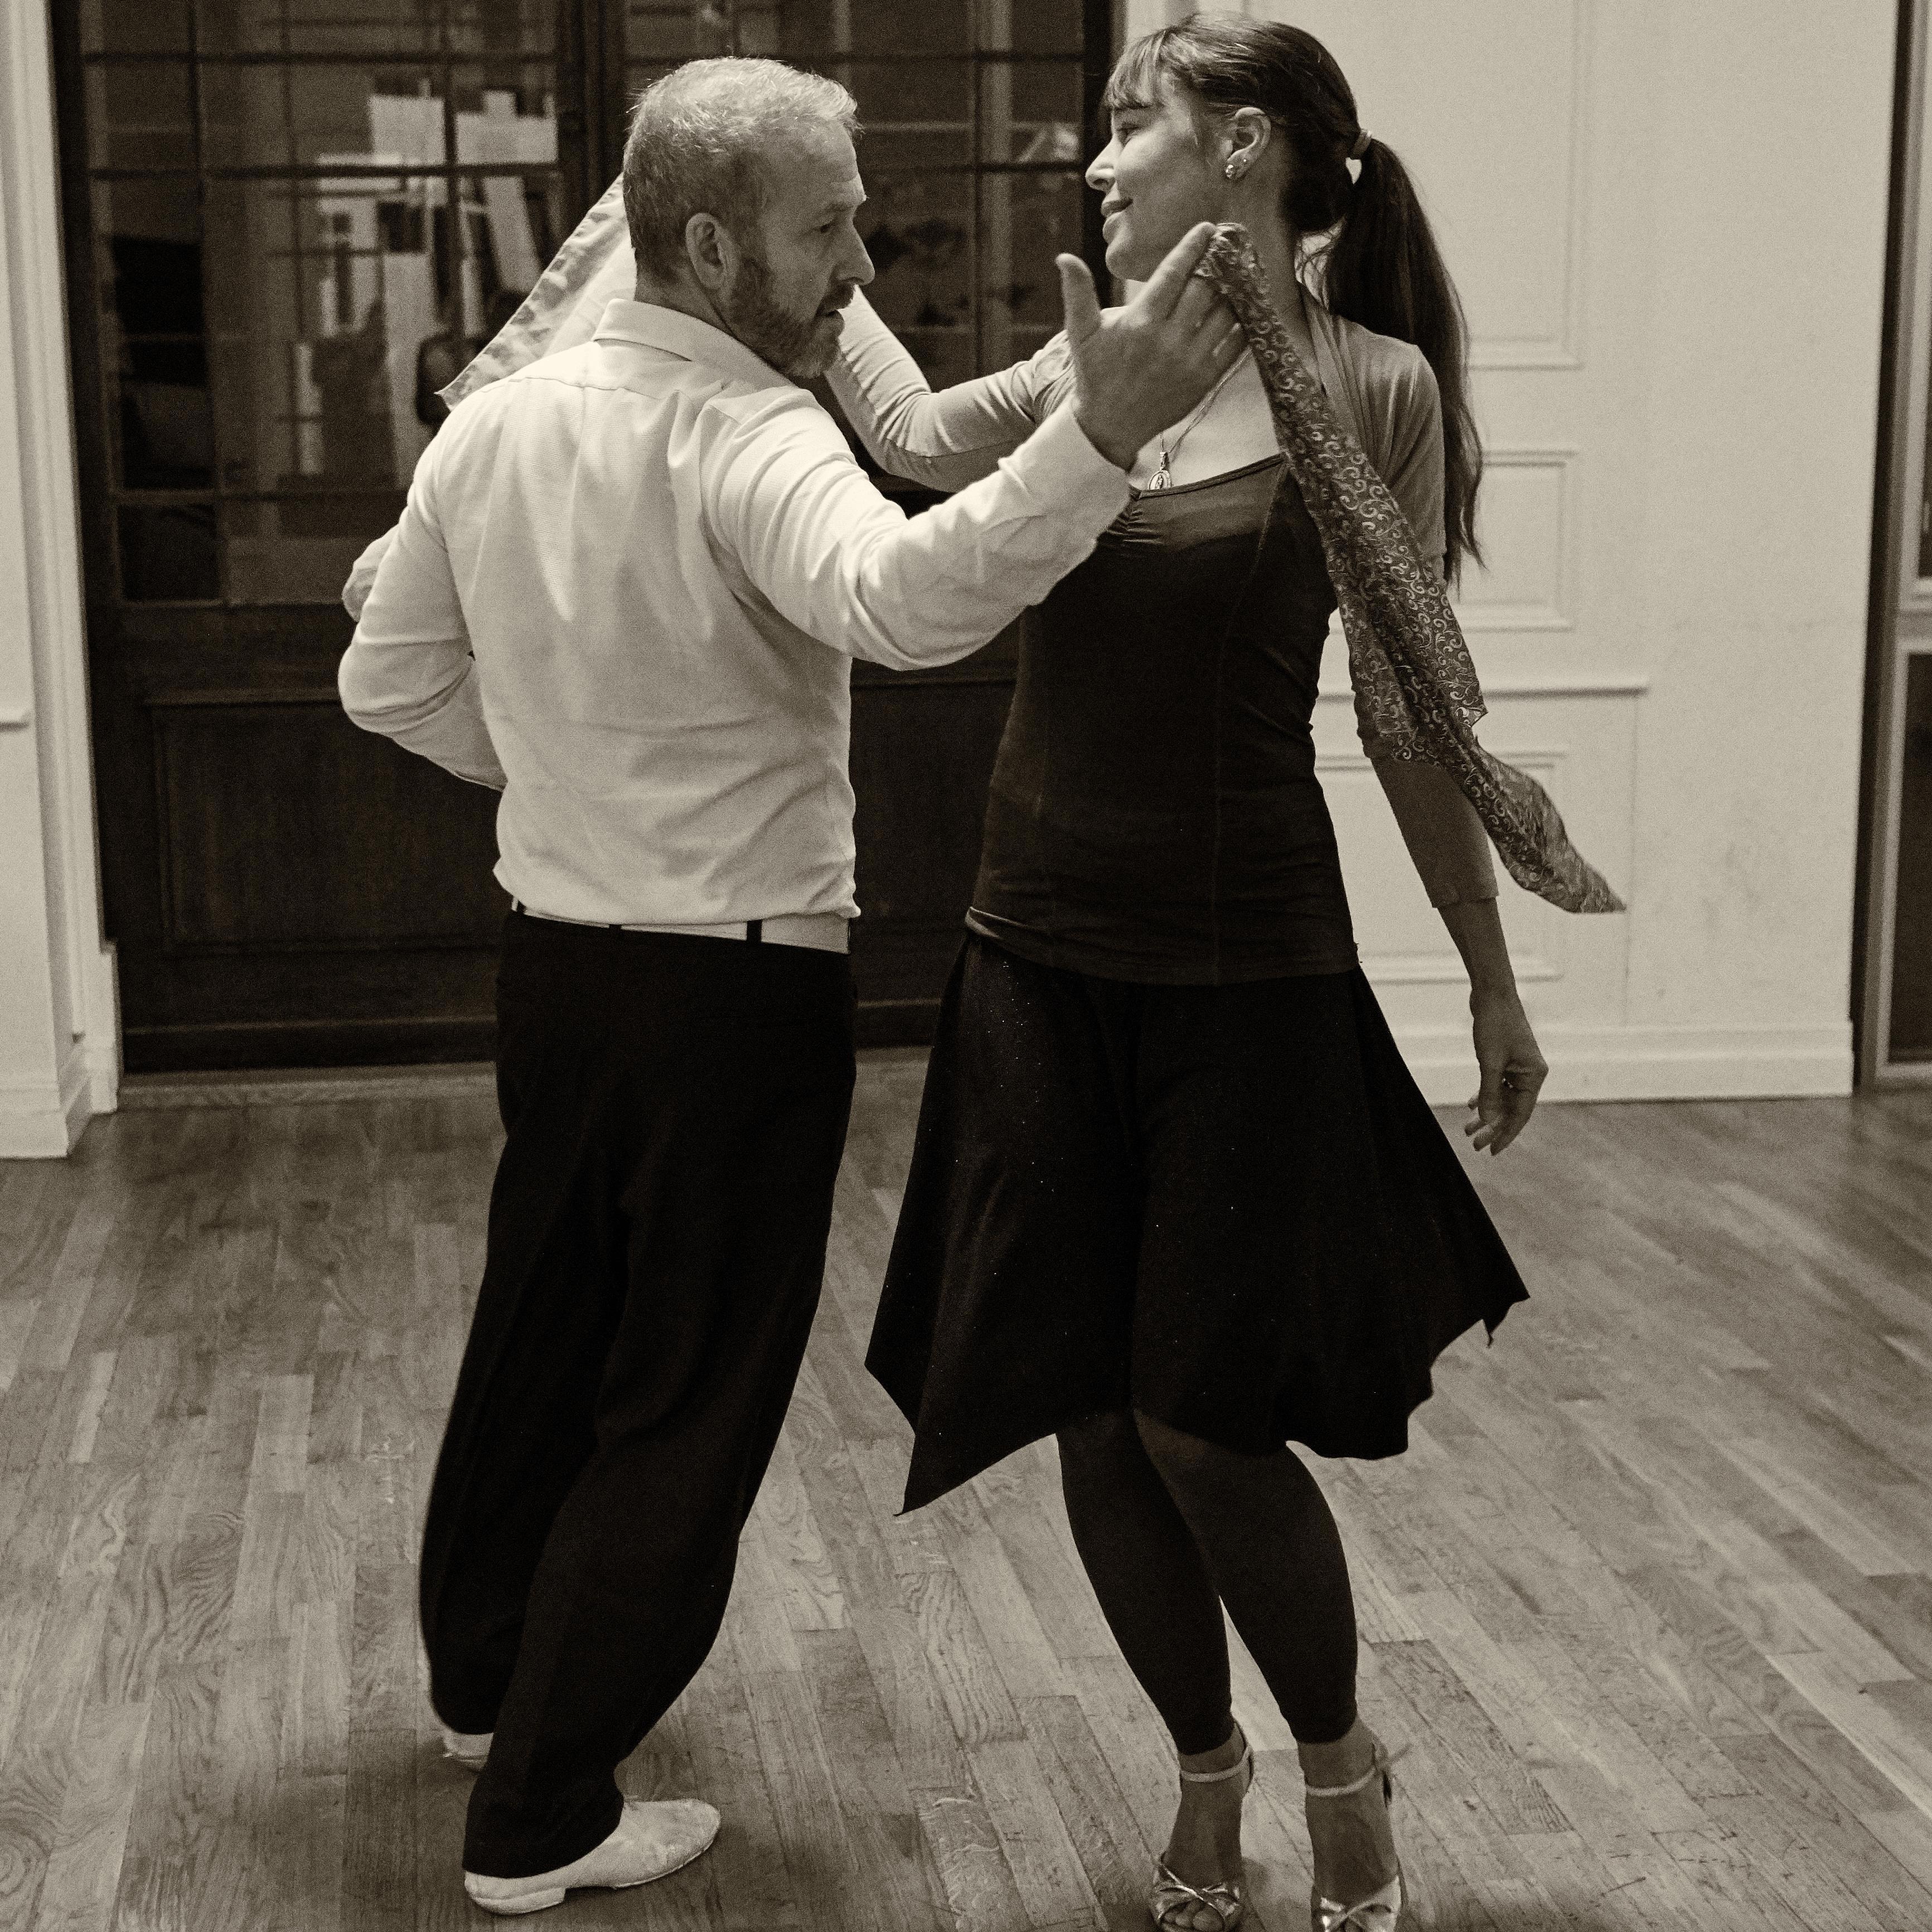 «Tangos de poesía», la poésie danse l'enchantement du tango